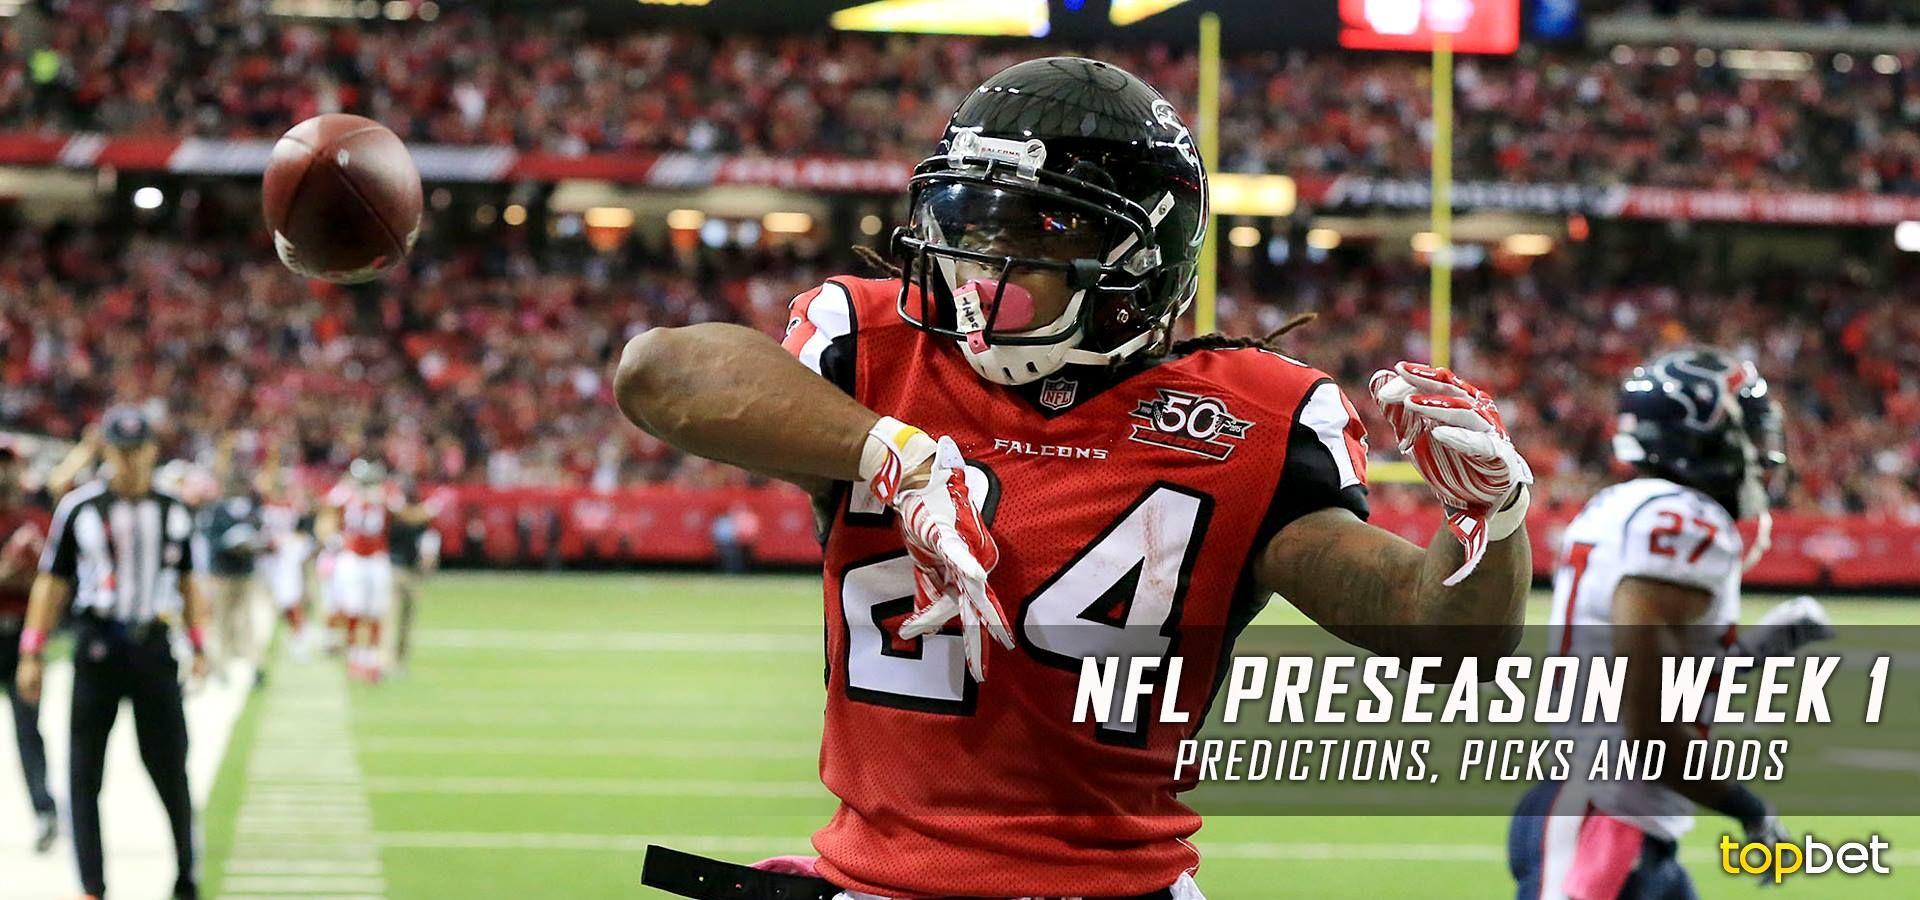 NFL Preseason Week 1 Predictions, Picks and Preview 2016